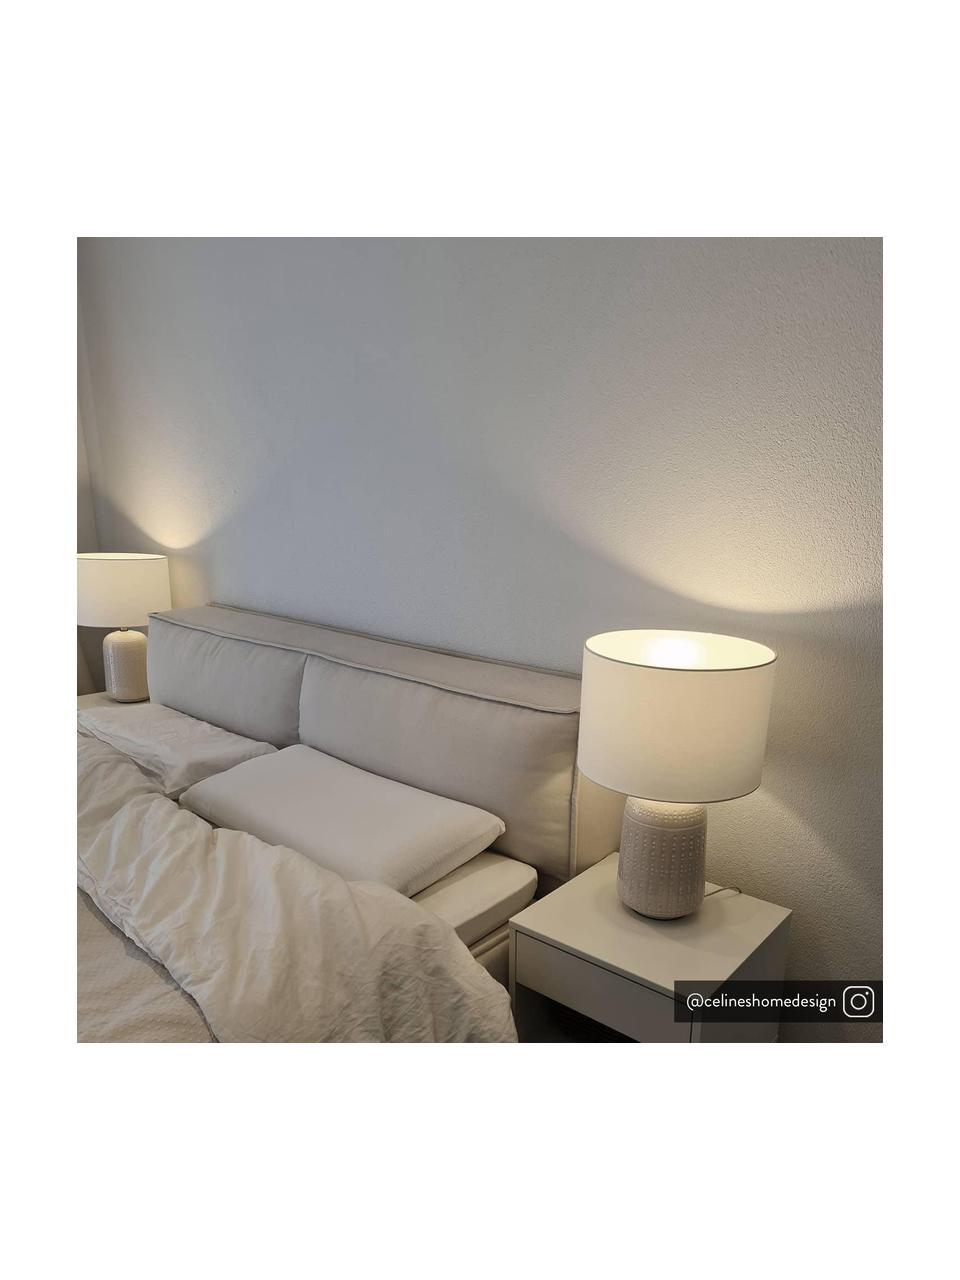 Keramik-Tischlampe Iva, Lampenschirm: Textil, Lampenfuß: Keramik, Lampenschirm: WeißLampenfuß: Cremeweiß, Messing, Ø 33 x H 53 cm